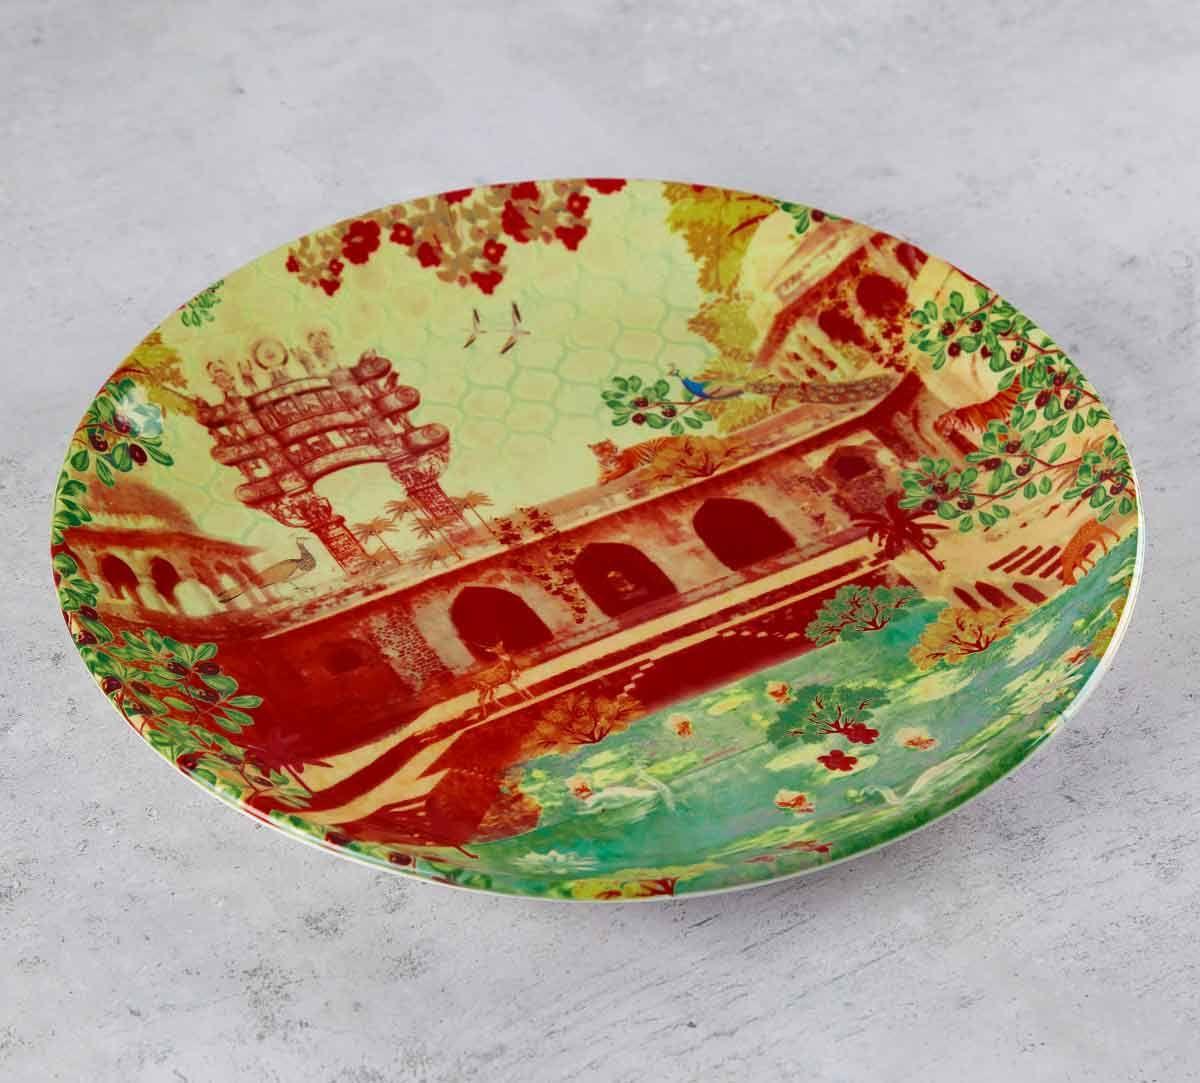 India Circus Mammalian Picnic 10 inch Decorative and Snacks Platter